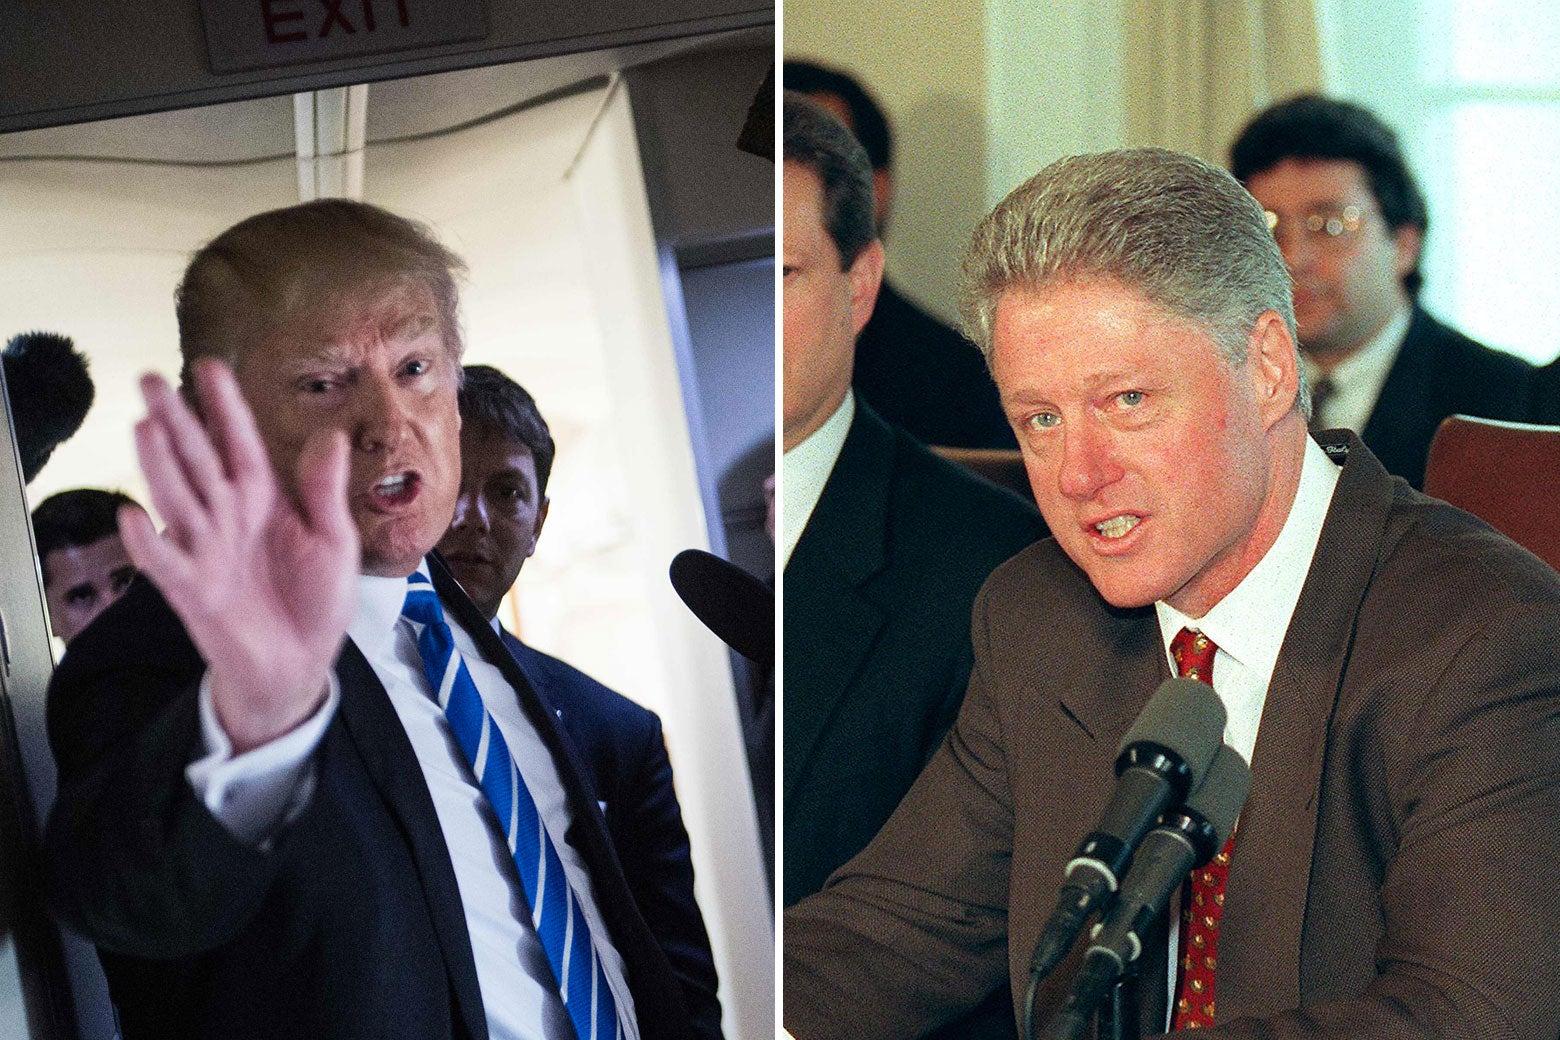 Donald Trump and Bill Clinton.